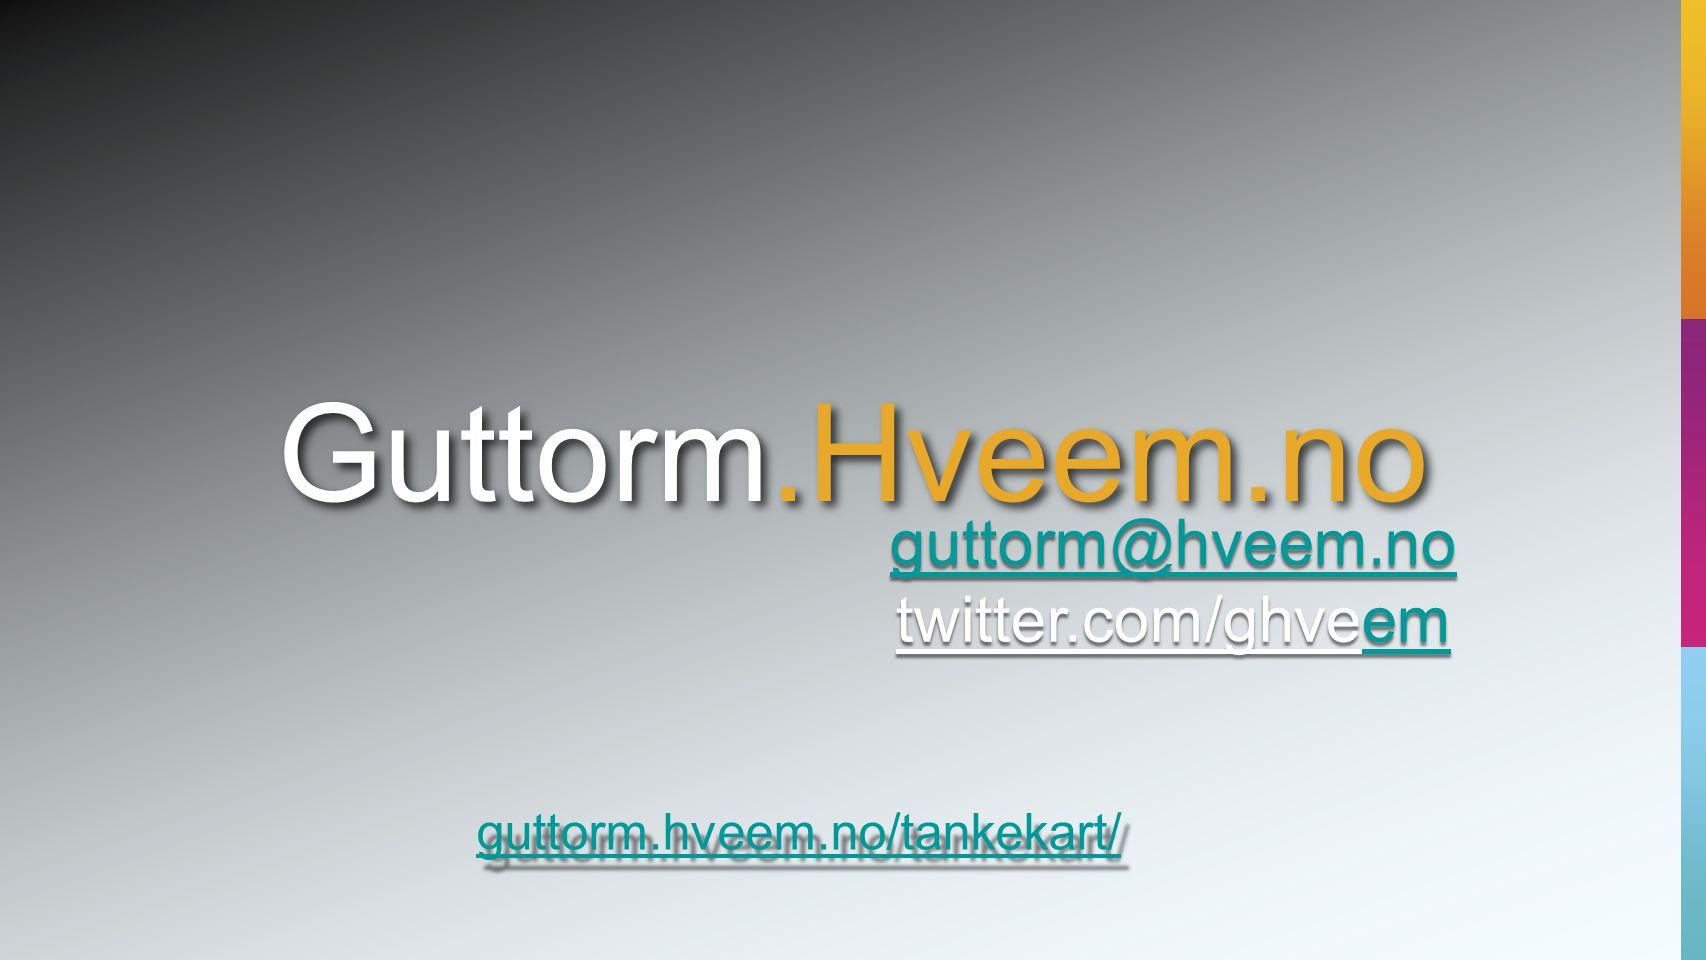 guttorm@hveem.no twitter.com/ghveemem guttorm@hveem.no twitter.com/ghveemem Guttorm.Hveem.no guttorm.hveem.no/tankekart/